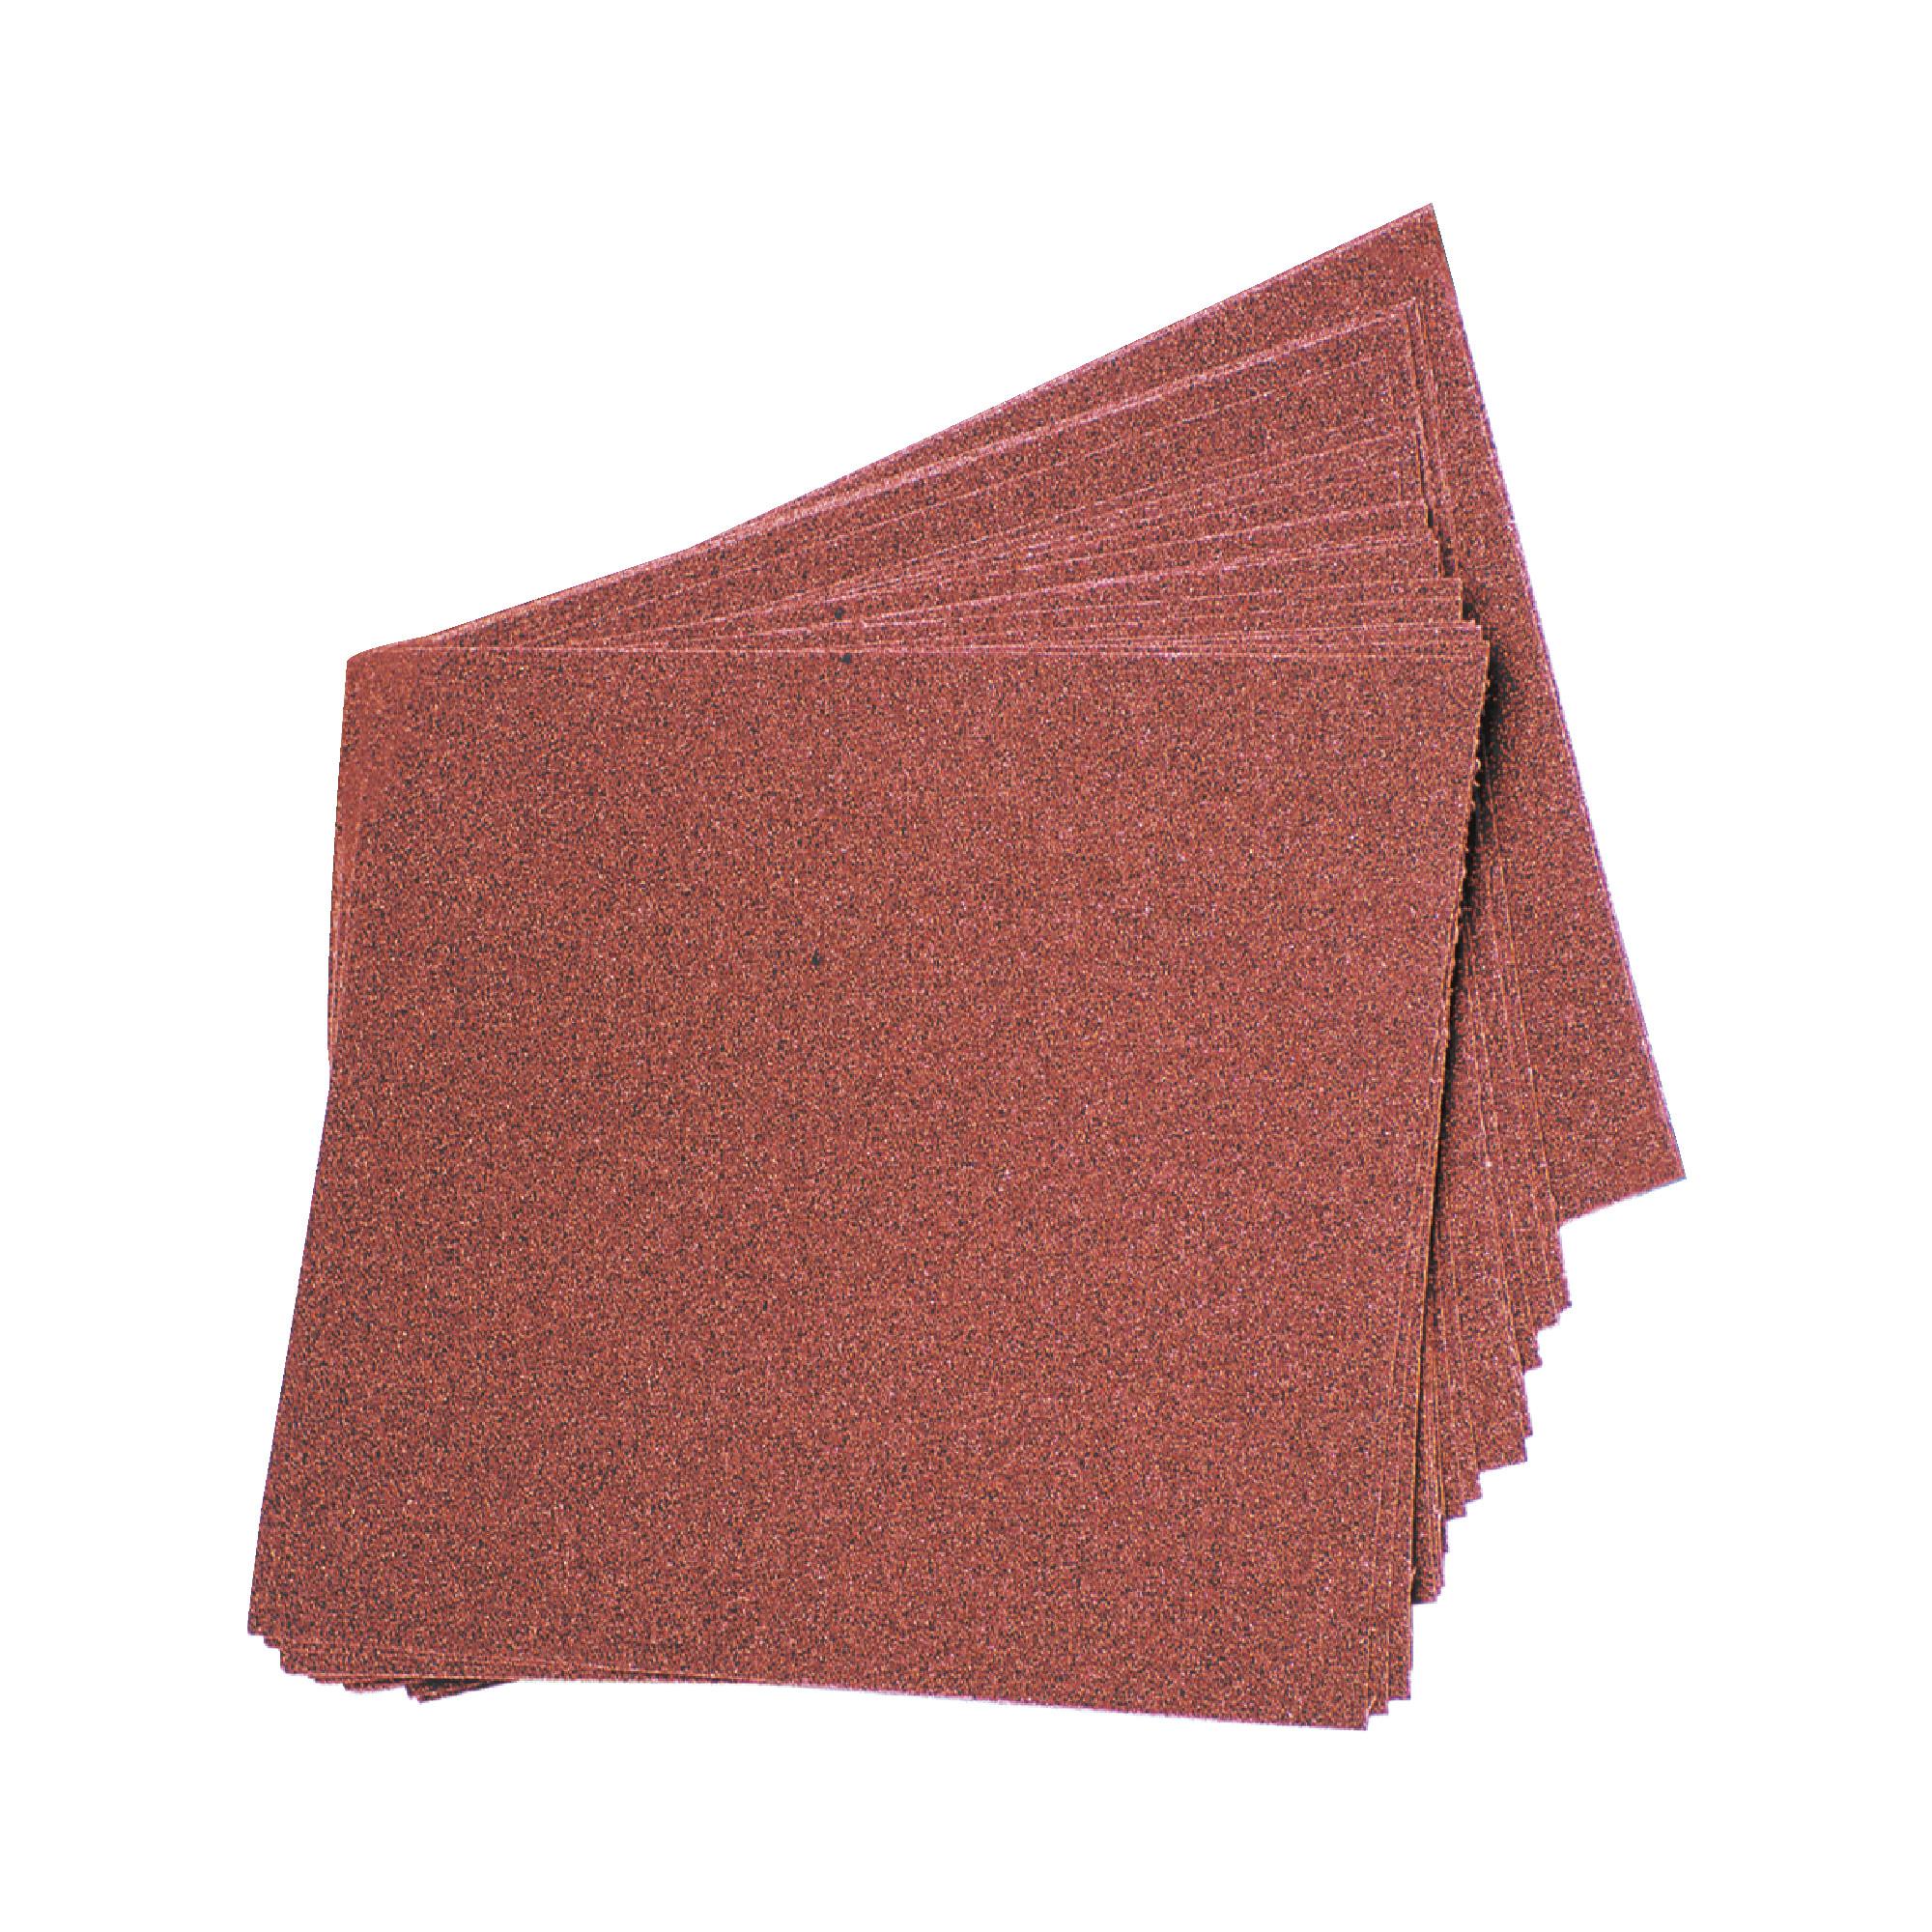 "9"" x 11"" Abrasive Aluminum Oxide Cloth Sheets"